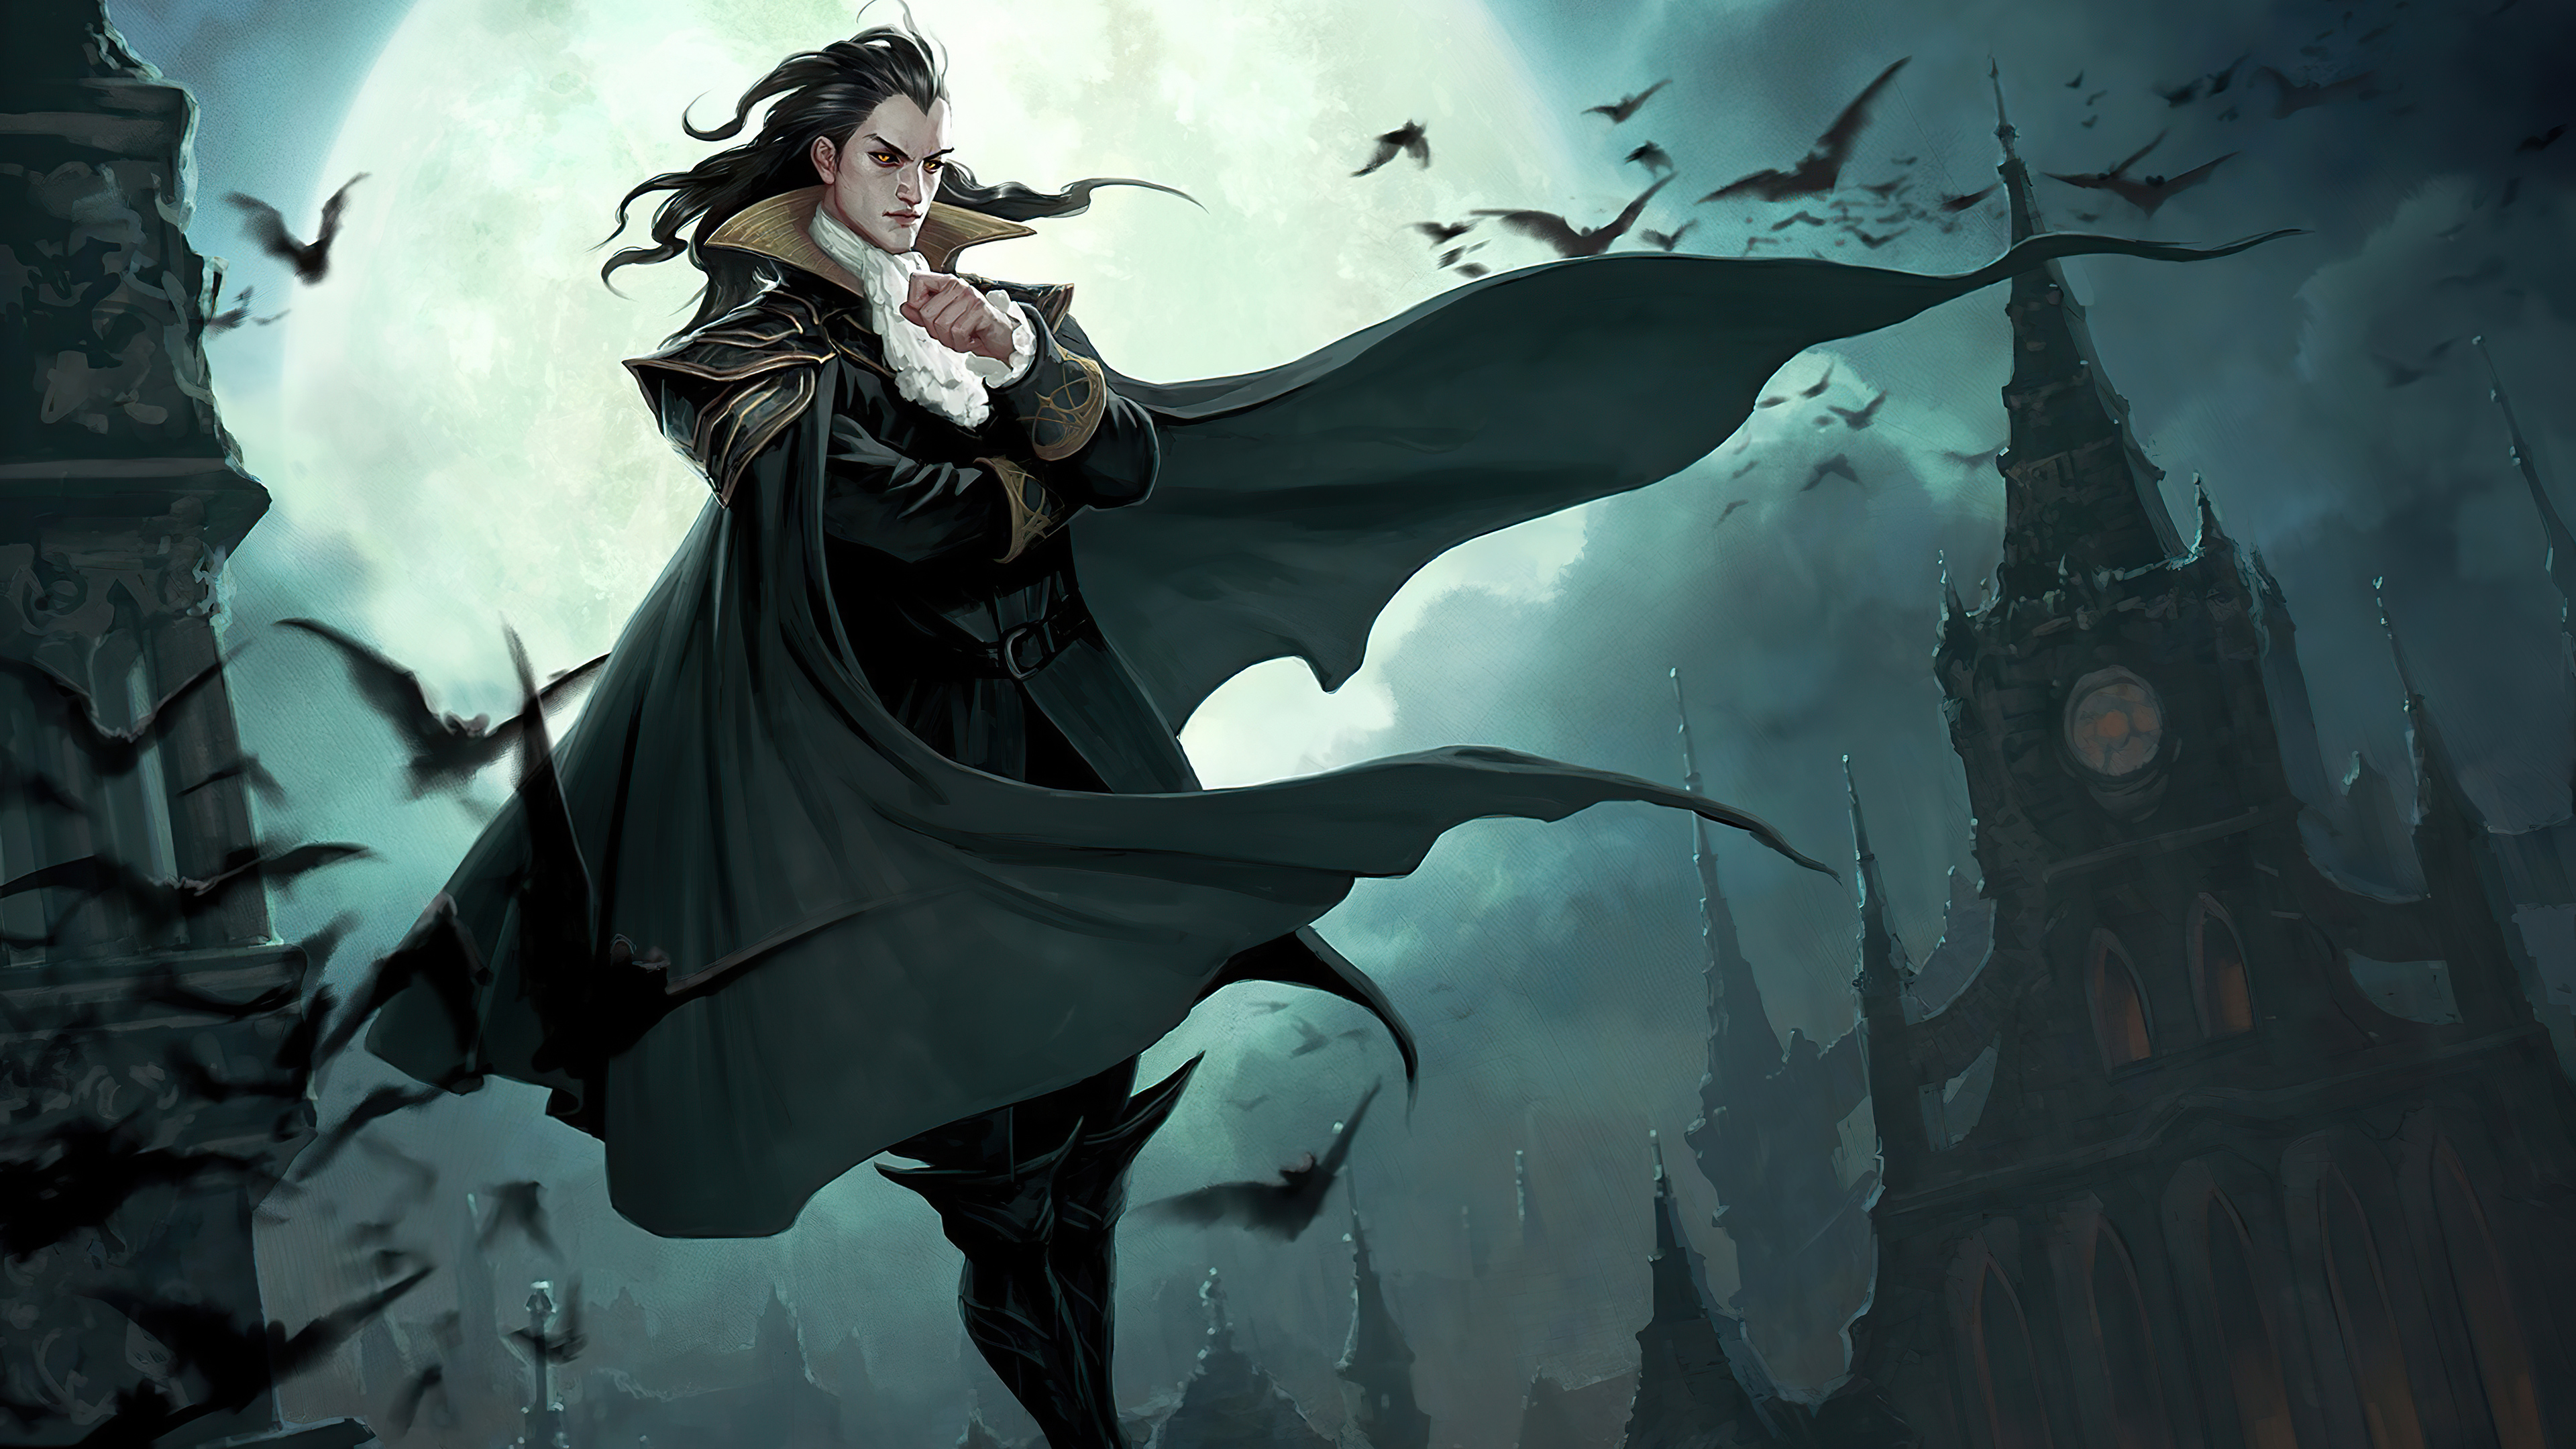 Vampire Magic The Gathering Wallpaper ...